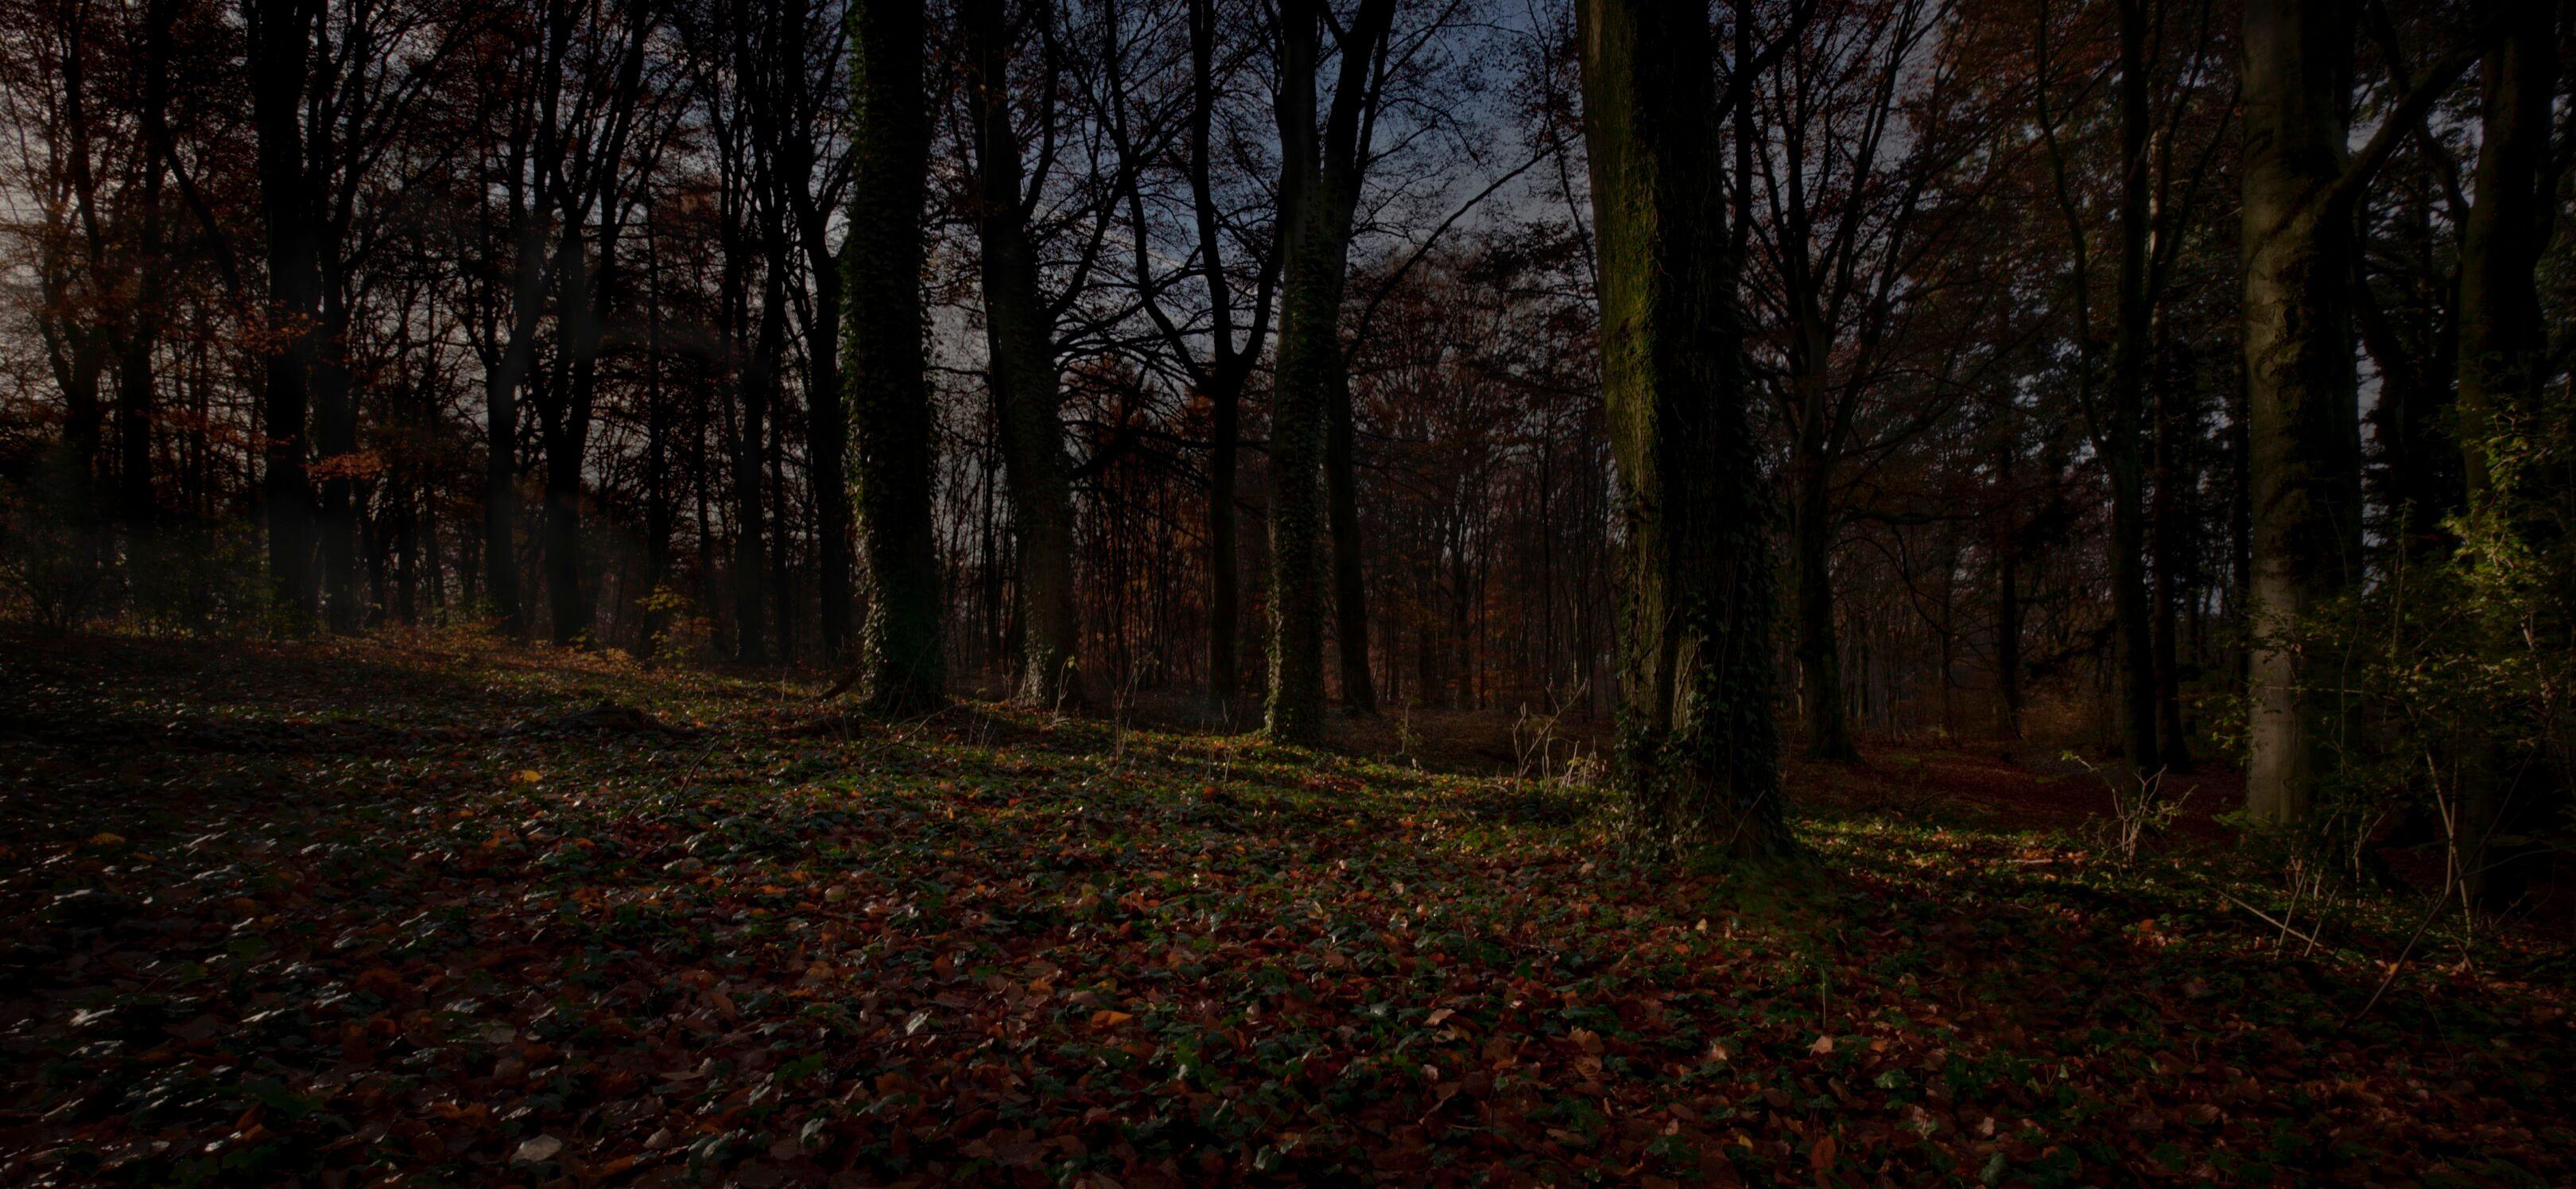 Jur Jurjen Poeles fotografie fragment landschap from dusk till dawn duister ochtendgloren dageraad vrijwerk vrij werk kunst kunstfotografie bos beuken